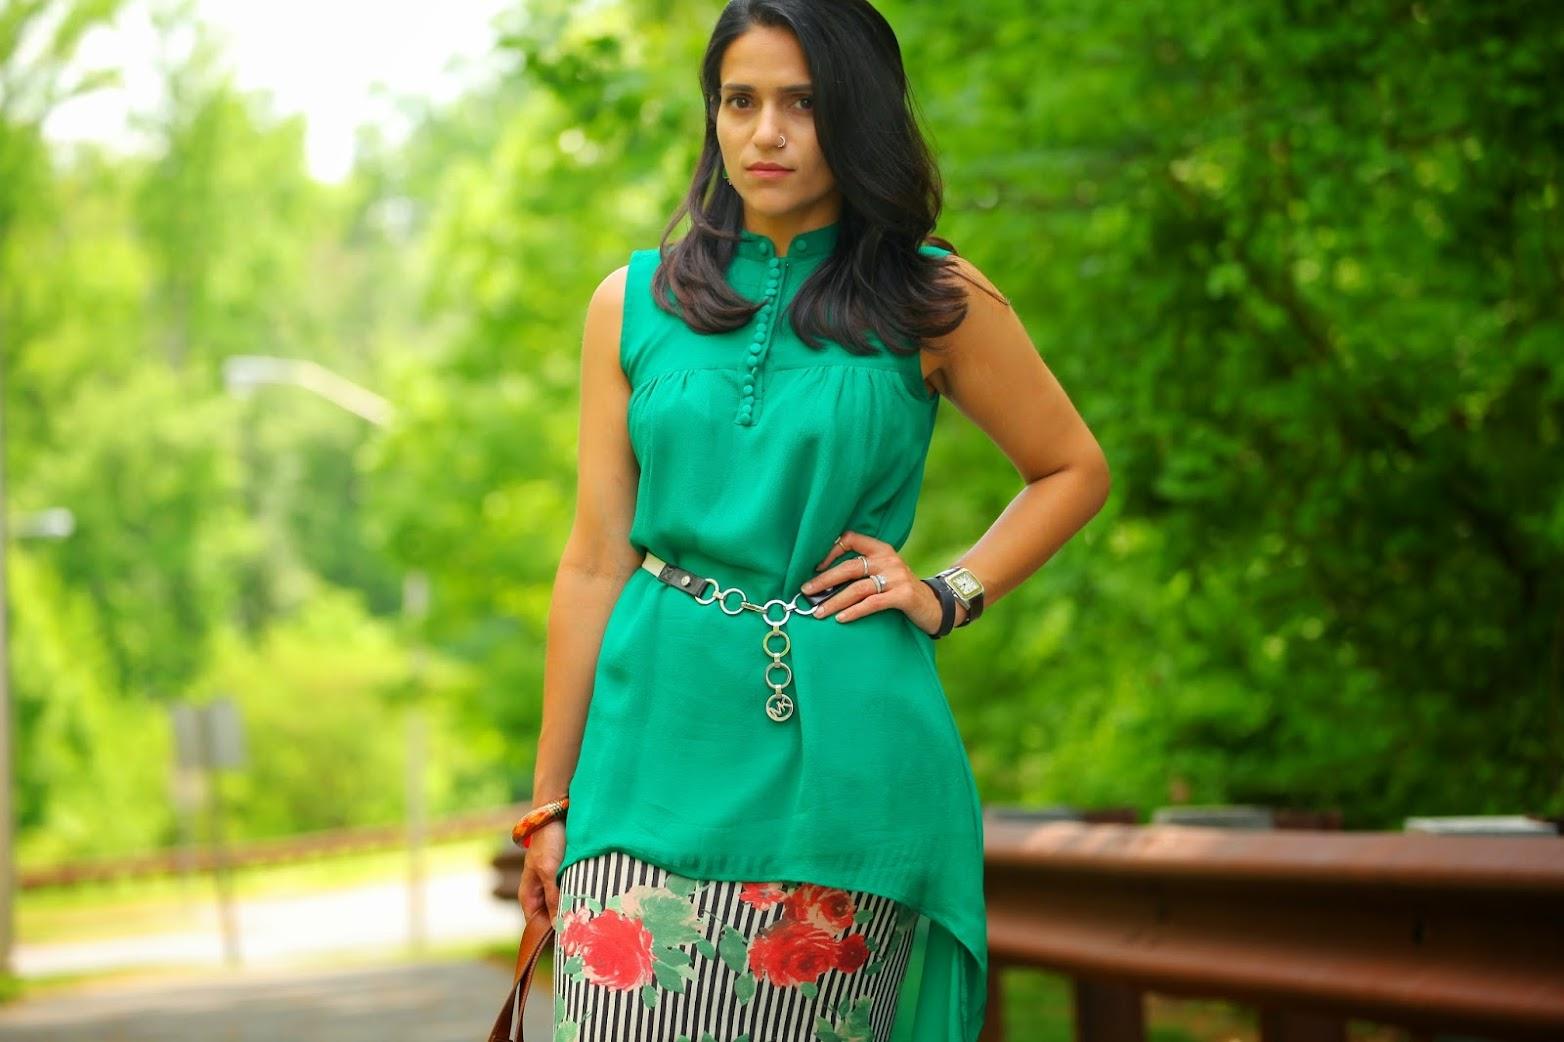 Top - Custom Made from India, Skirt - Asos, Footwear - Tommy Hilfiger, Bag - Mulberry, Belt - Michael Kors